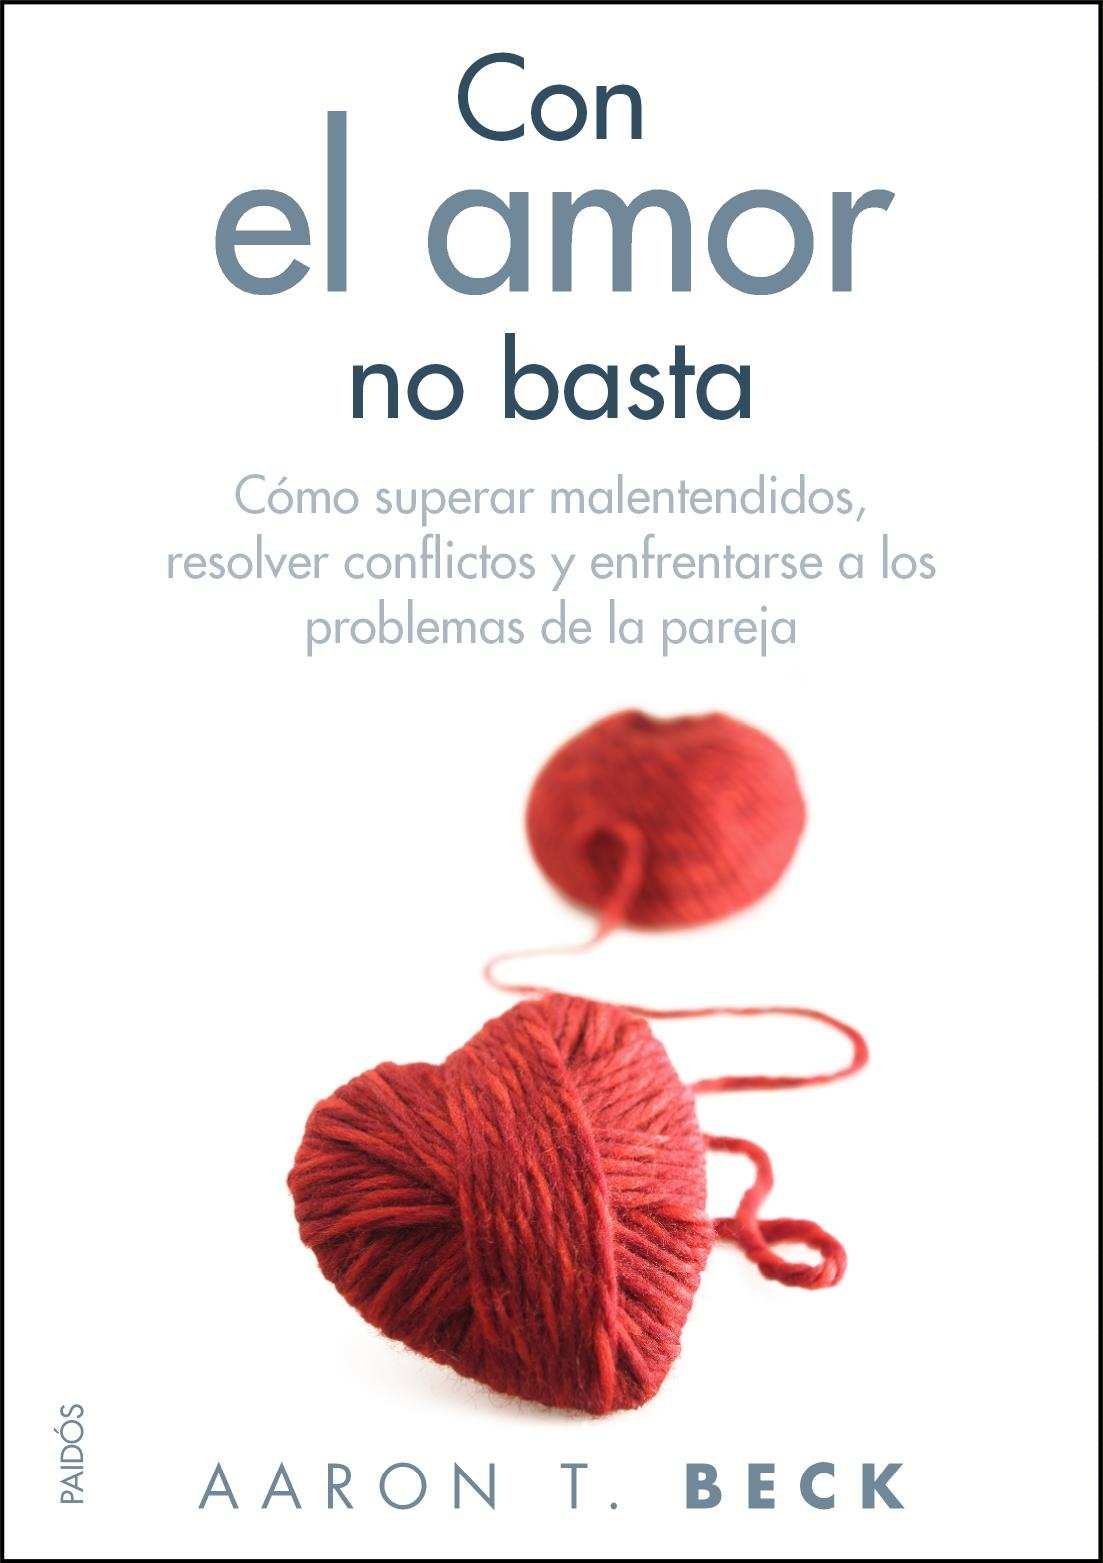 Con El Amor No Basta T Beck Aaron 9788449325557 Amazon Com Books